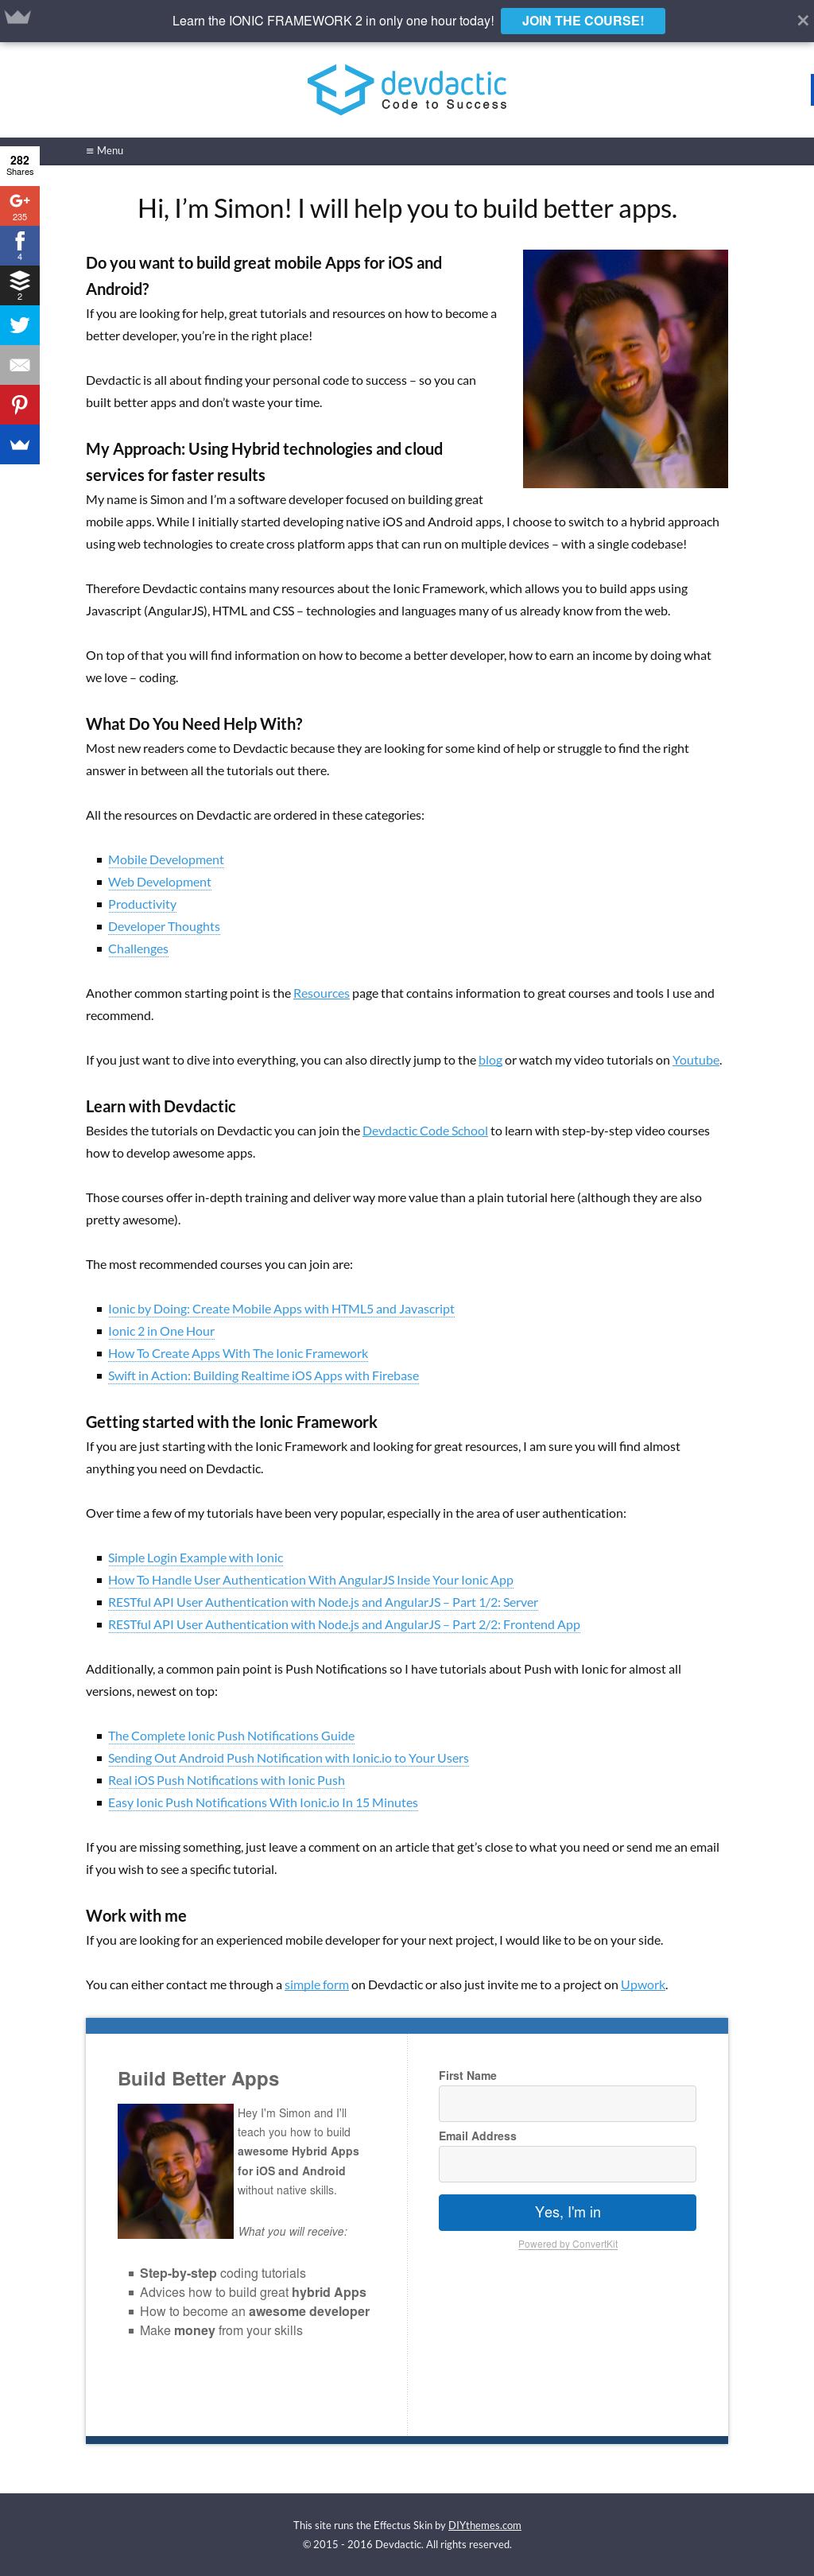 Owler Reports - Devdactic Blog Building a Signature Drawpad